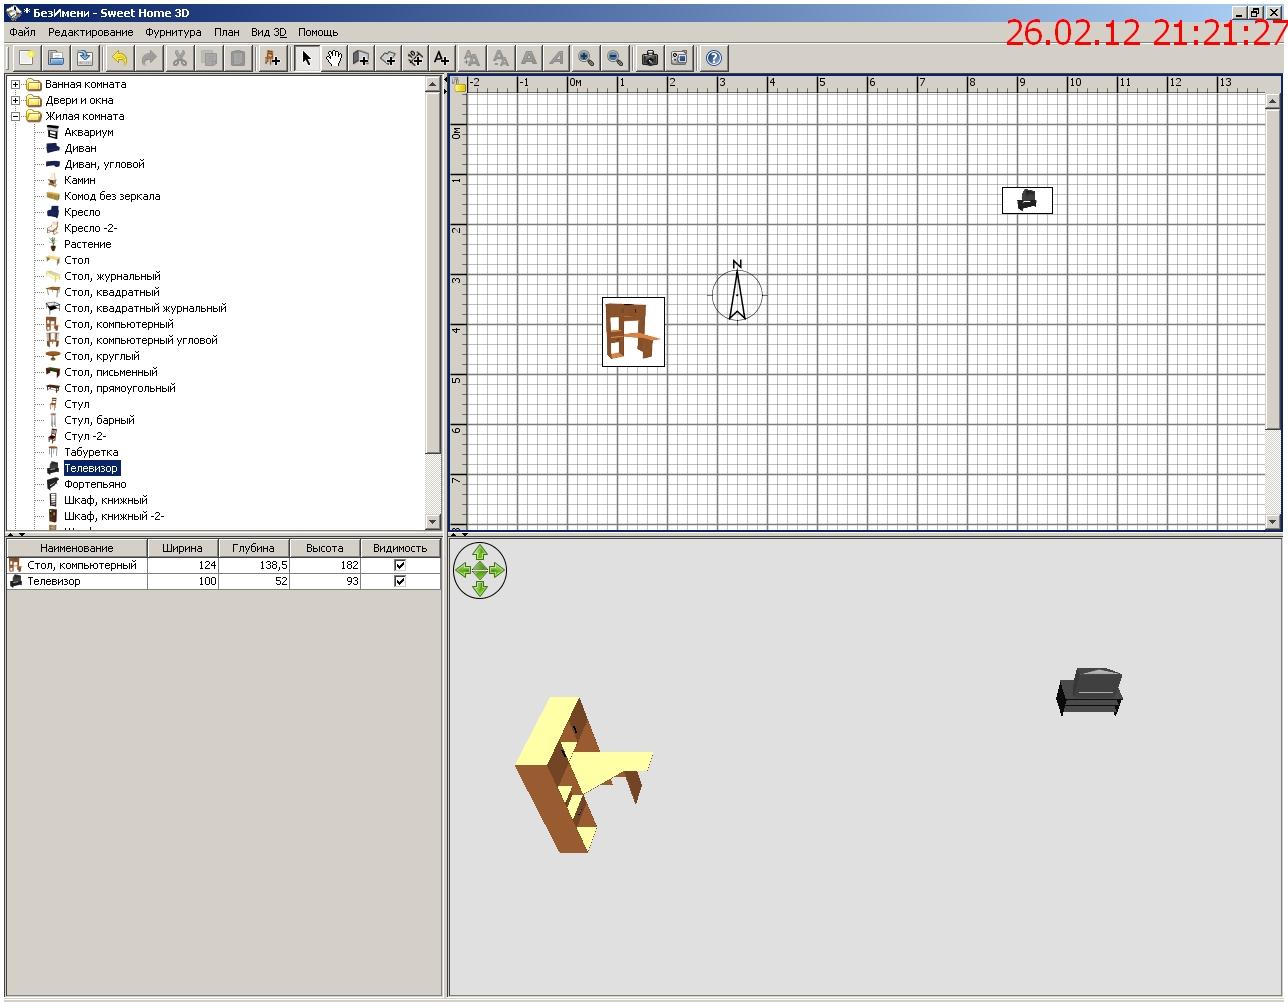 Программа для синхронизации ipad с компьютером - f38